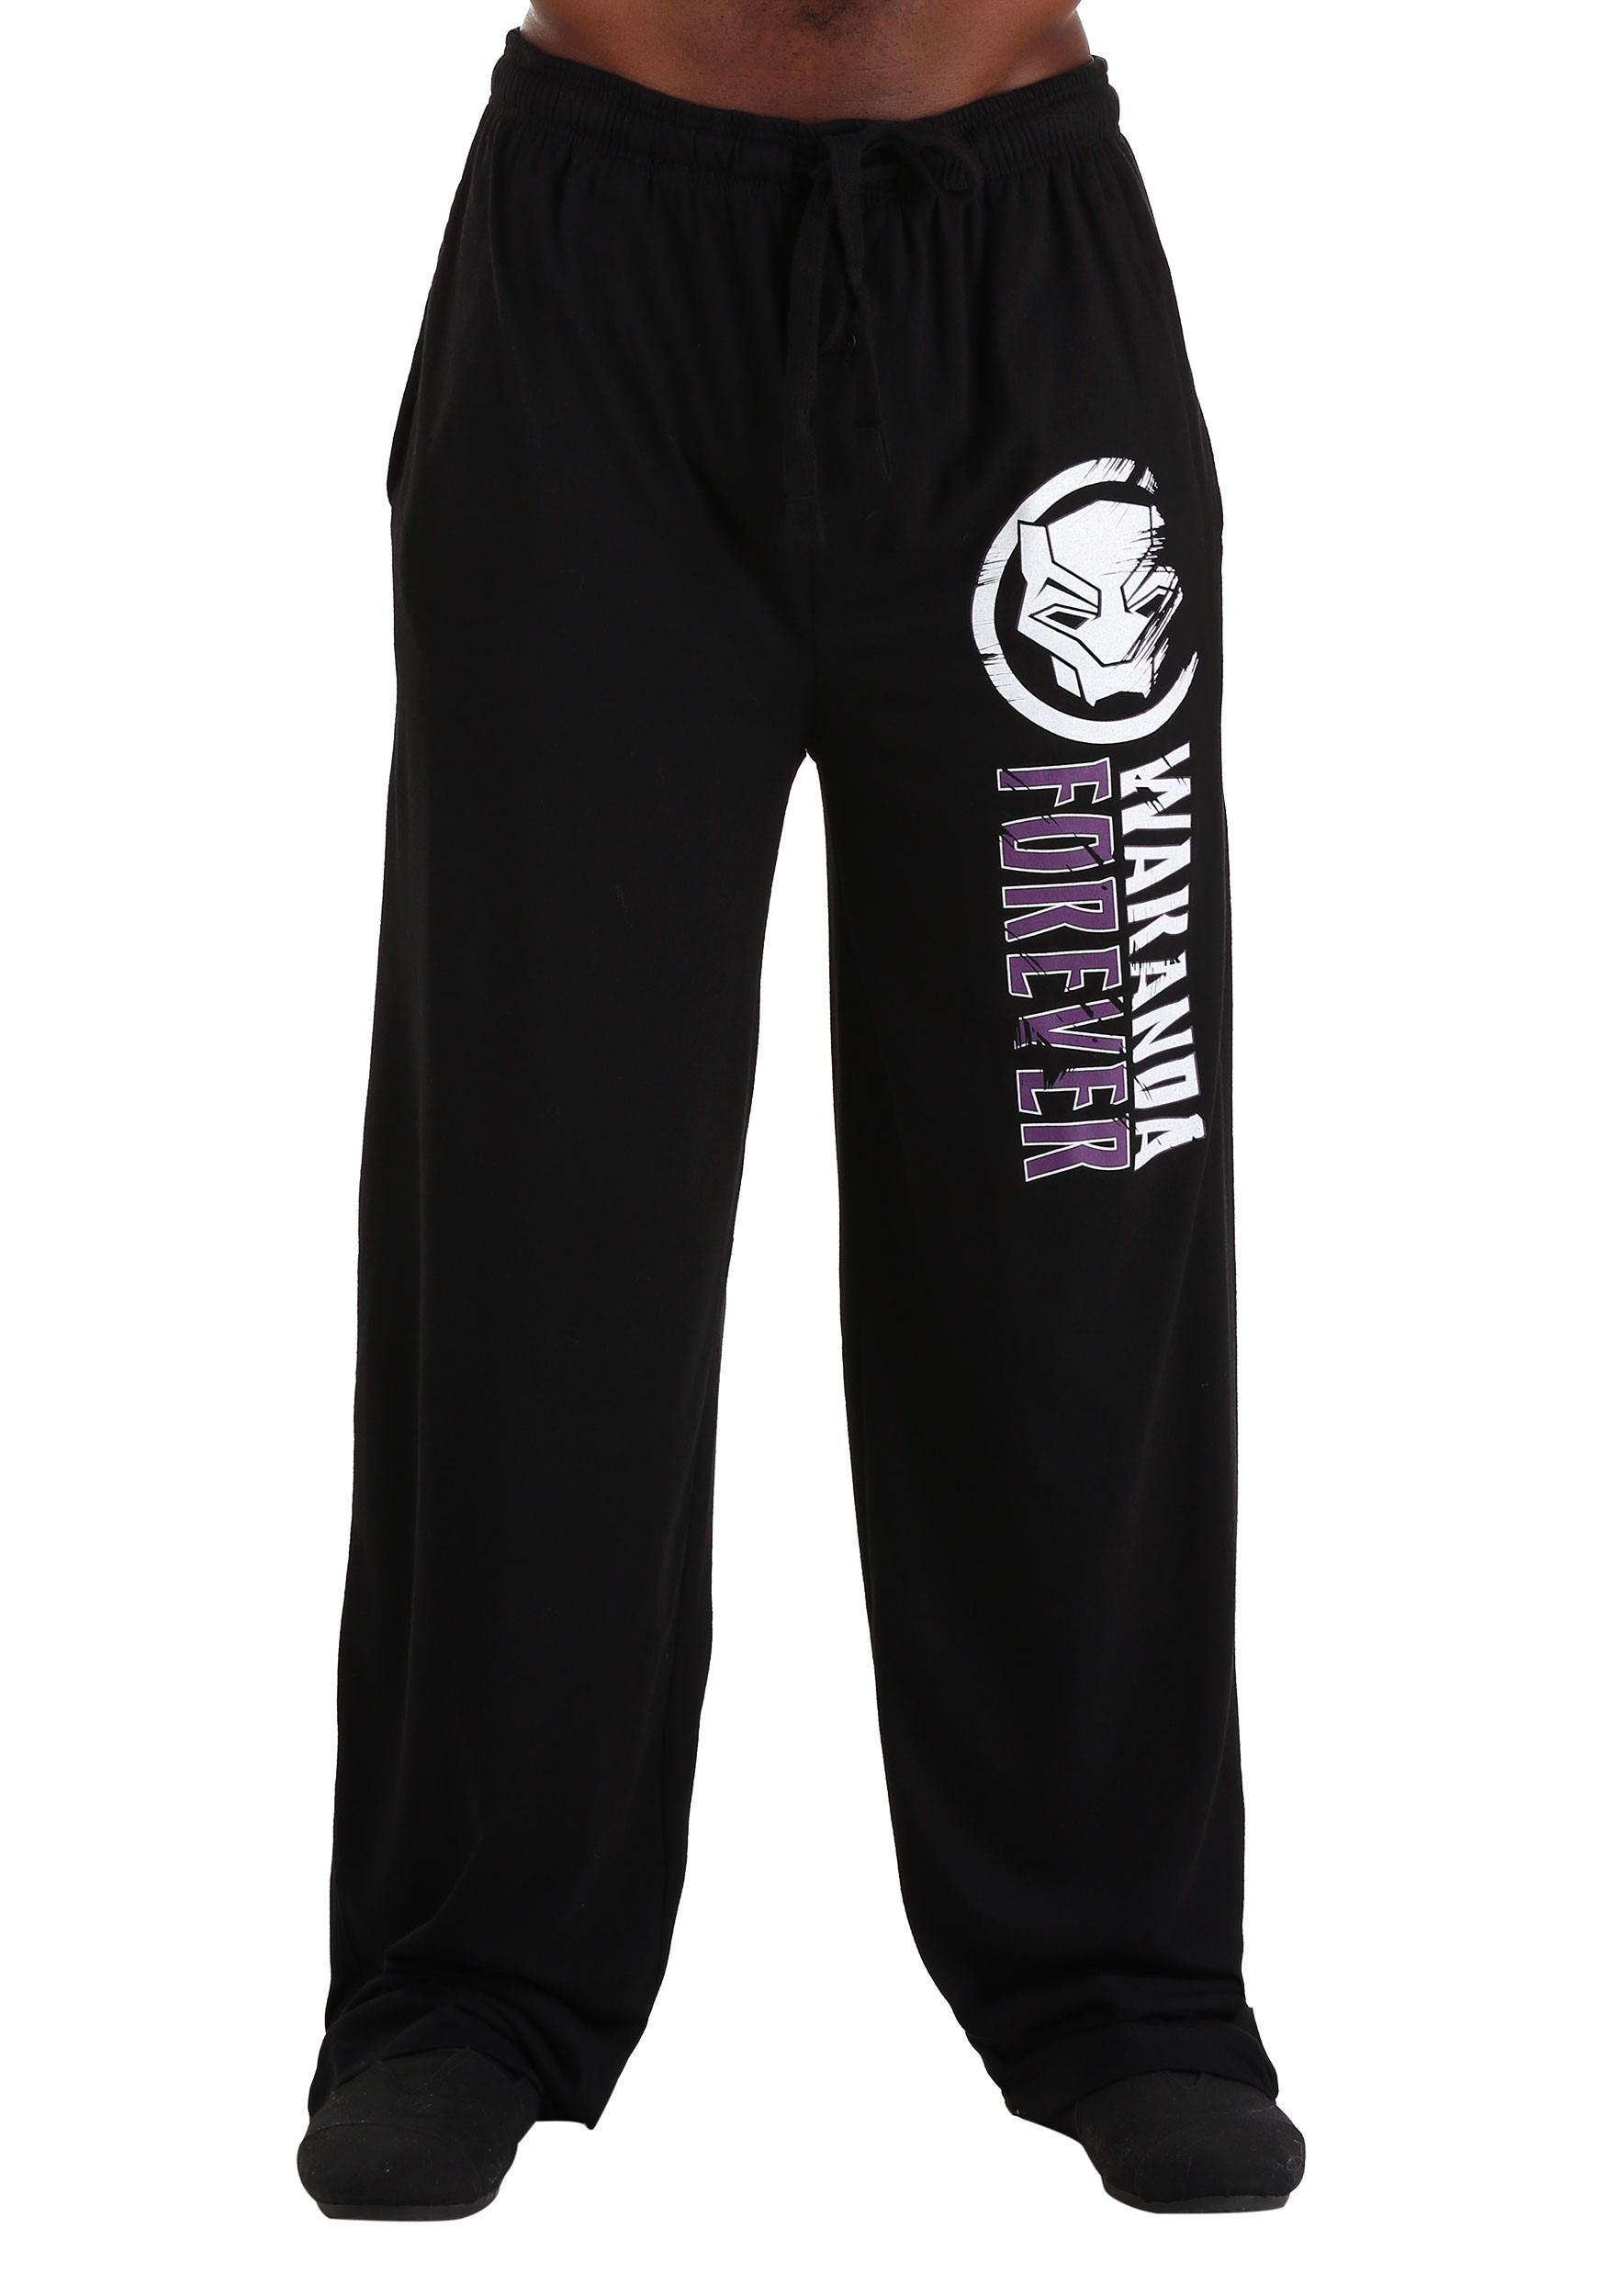 Wakanda Forever Black Panther Sleep/Lounge Pants